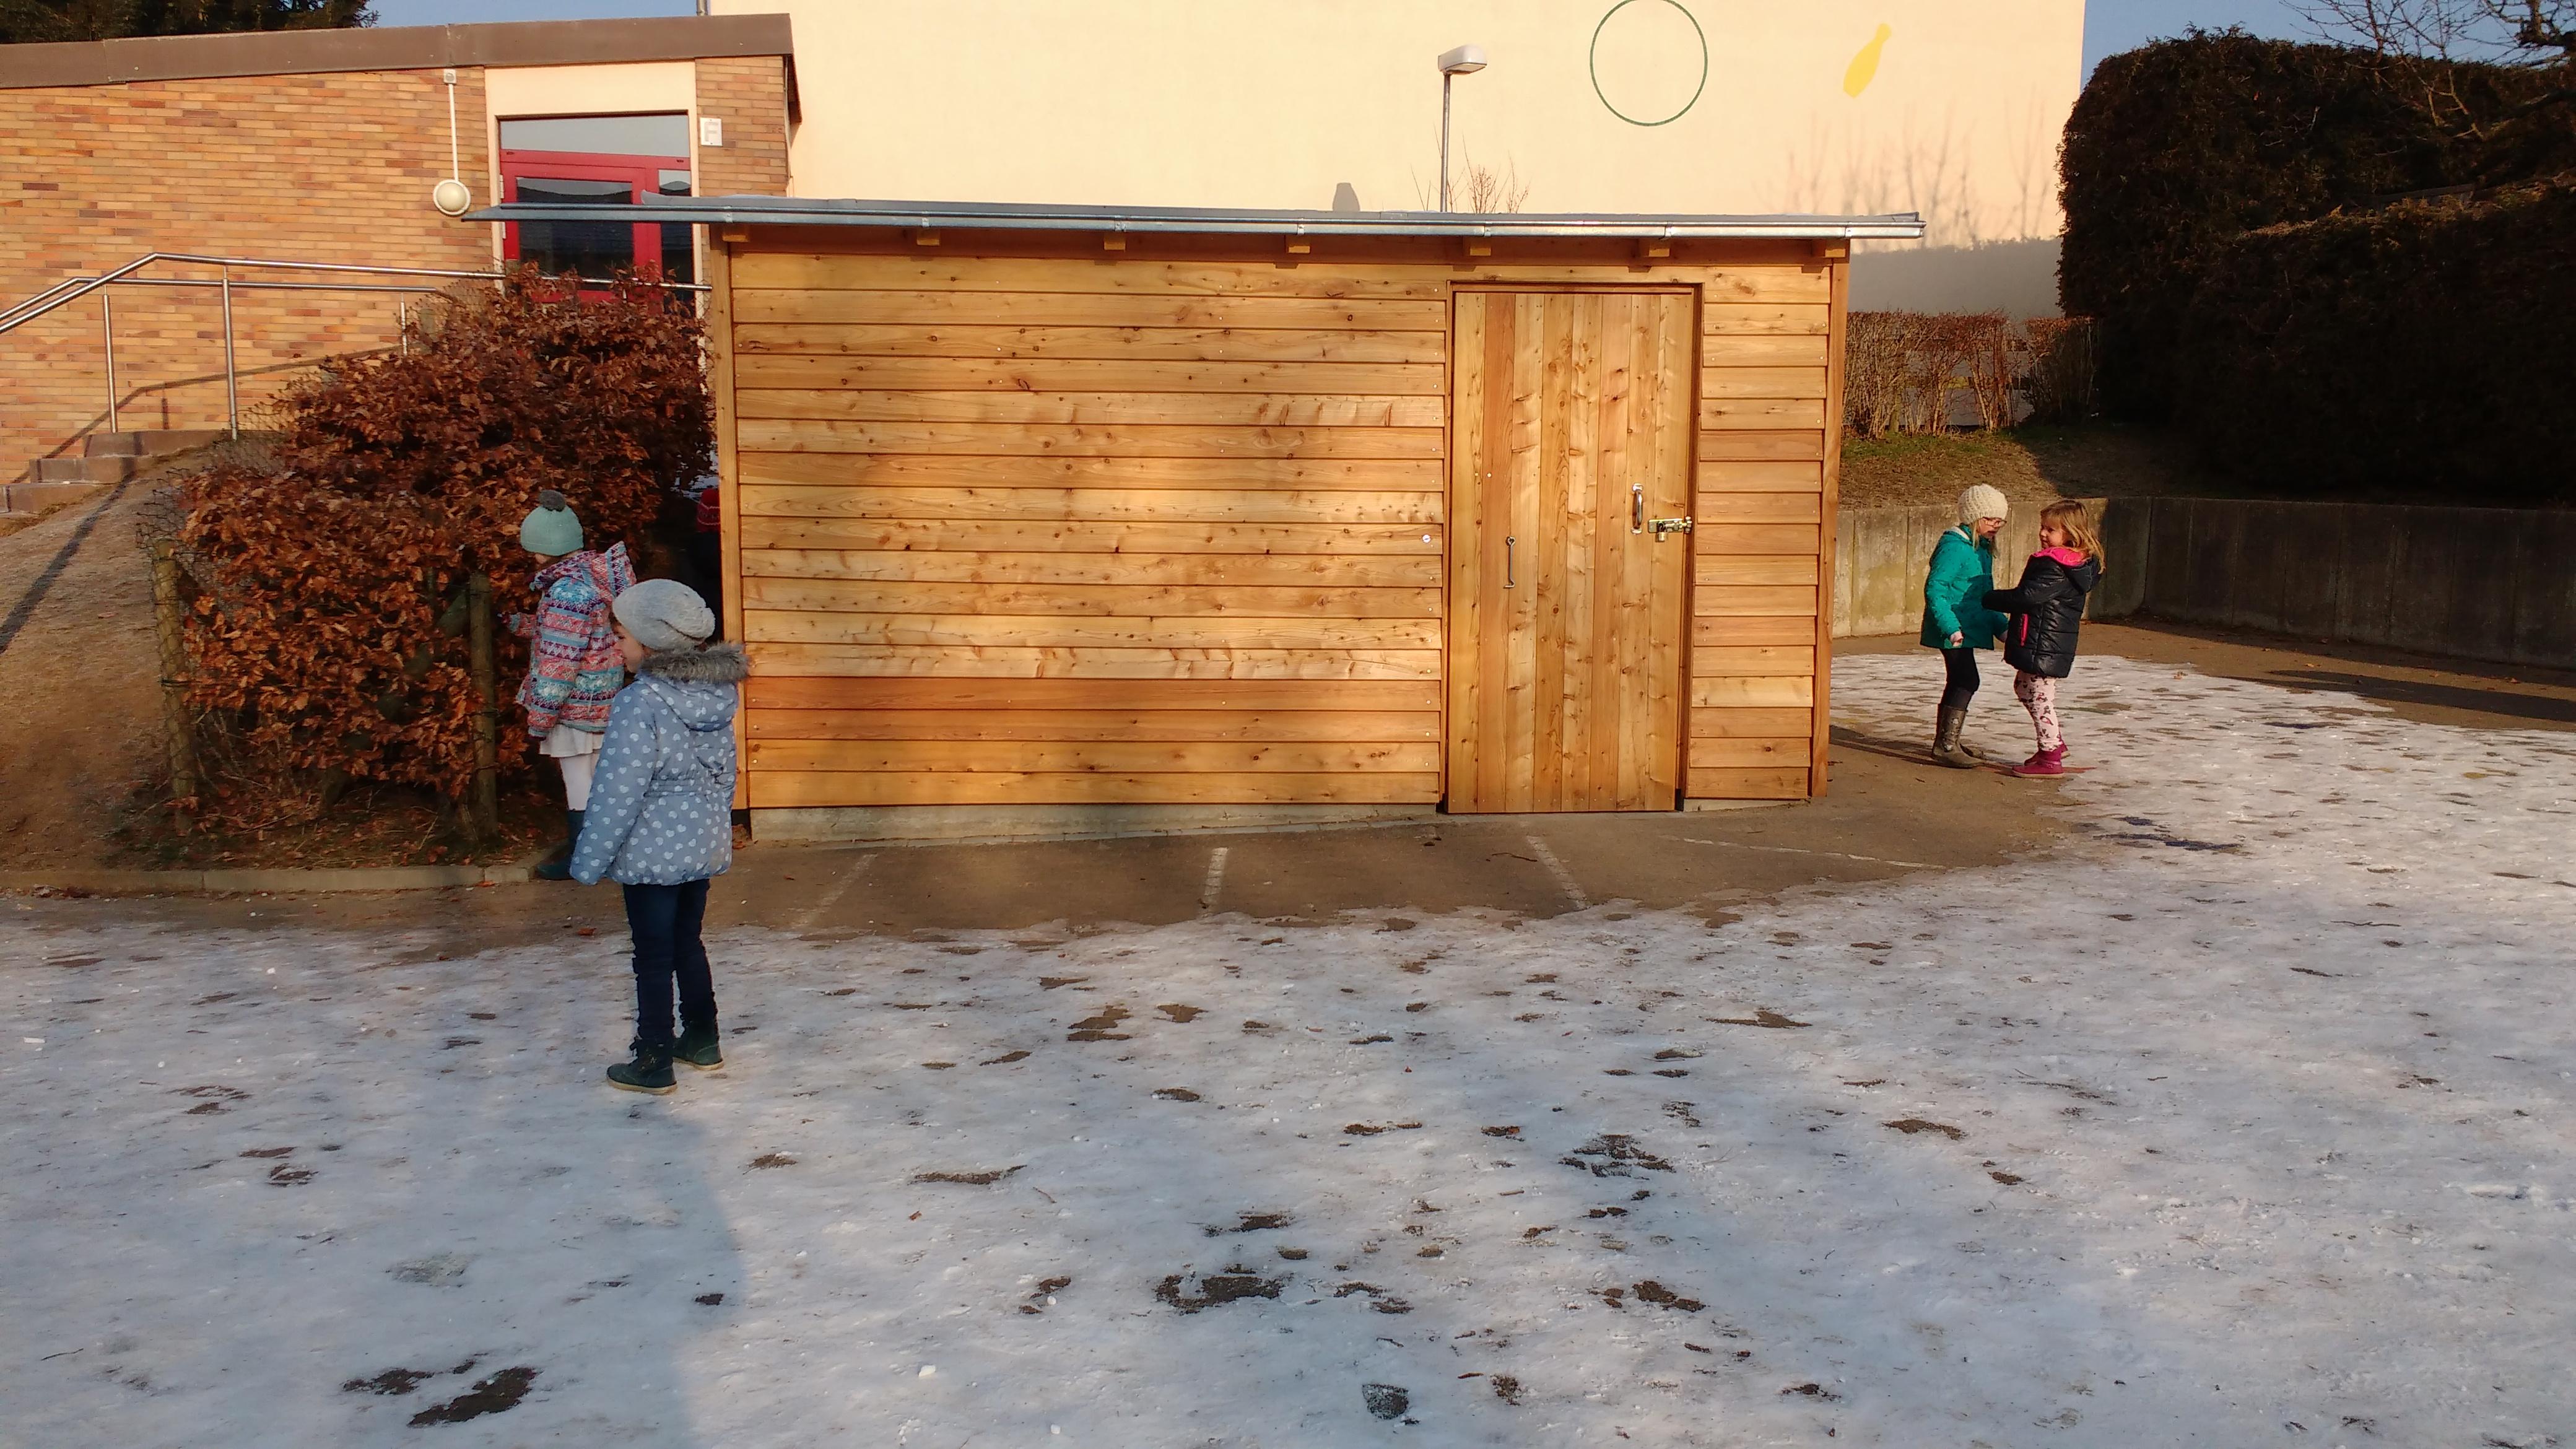 Oberer Pausenhof : Grundschule am Treppenweg